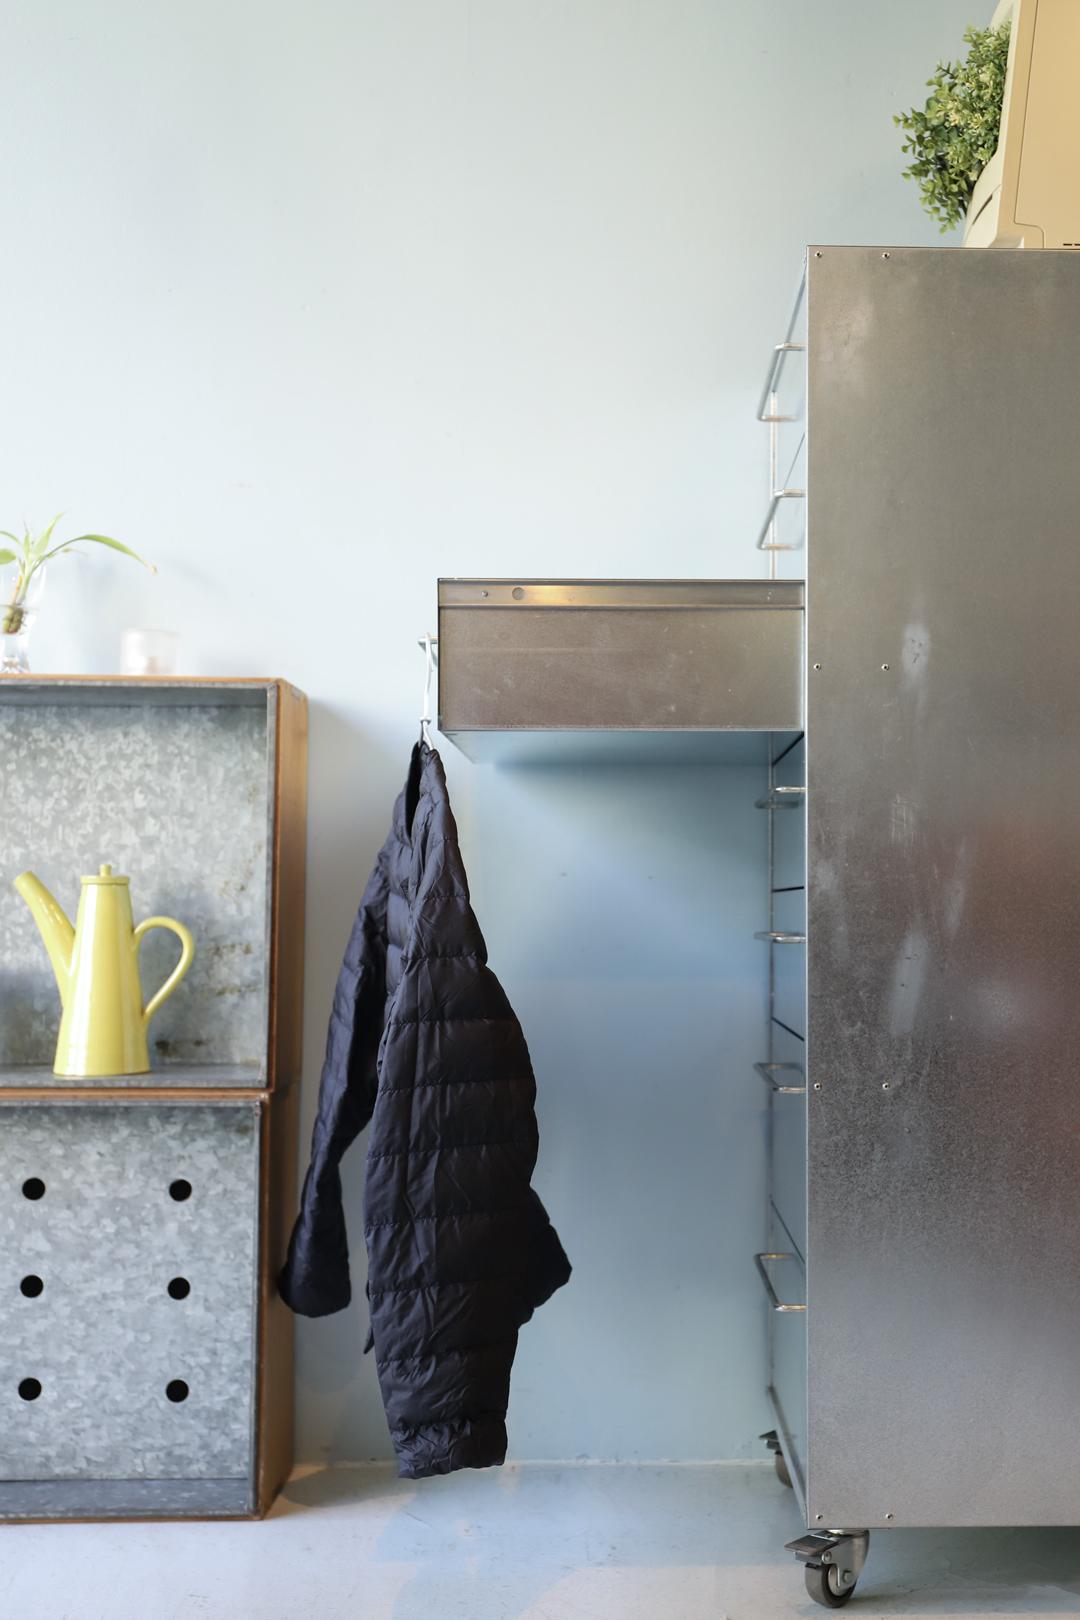 Industrial Design Iron Cabinet/アイアン ブリキ キャビネット チェスト 収納家具 インダストリアルデザイン